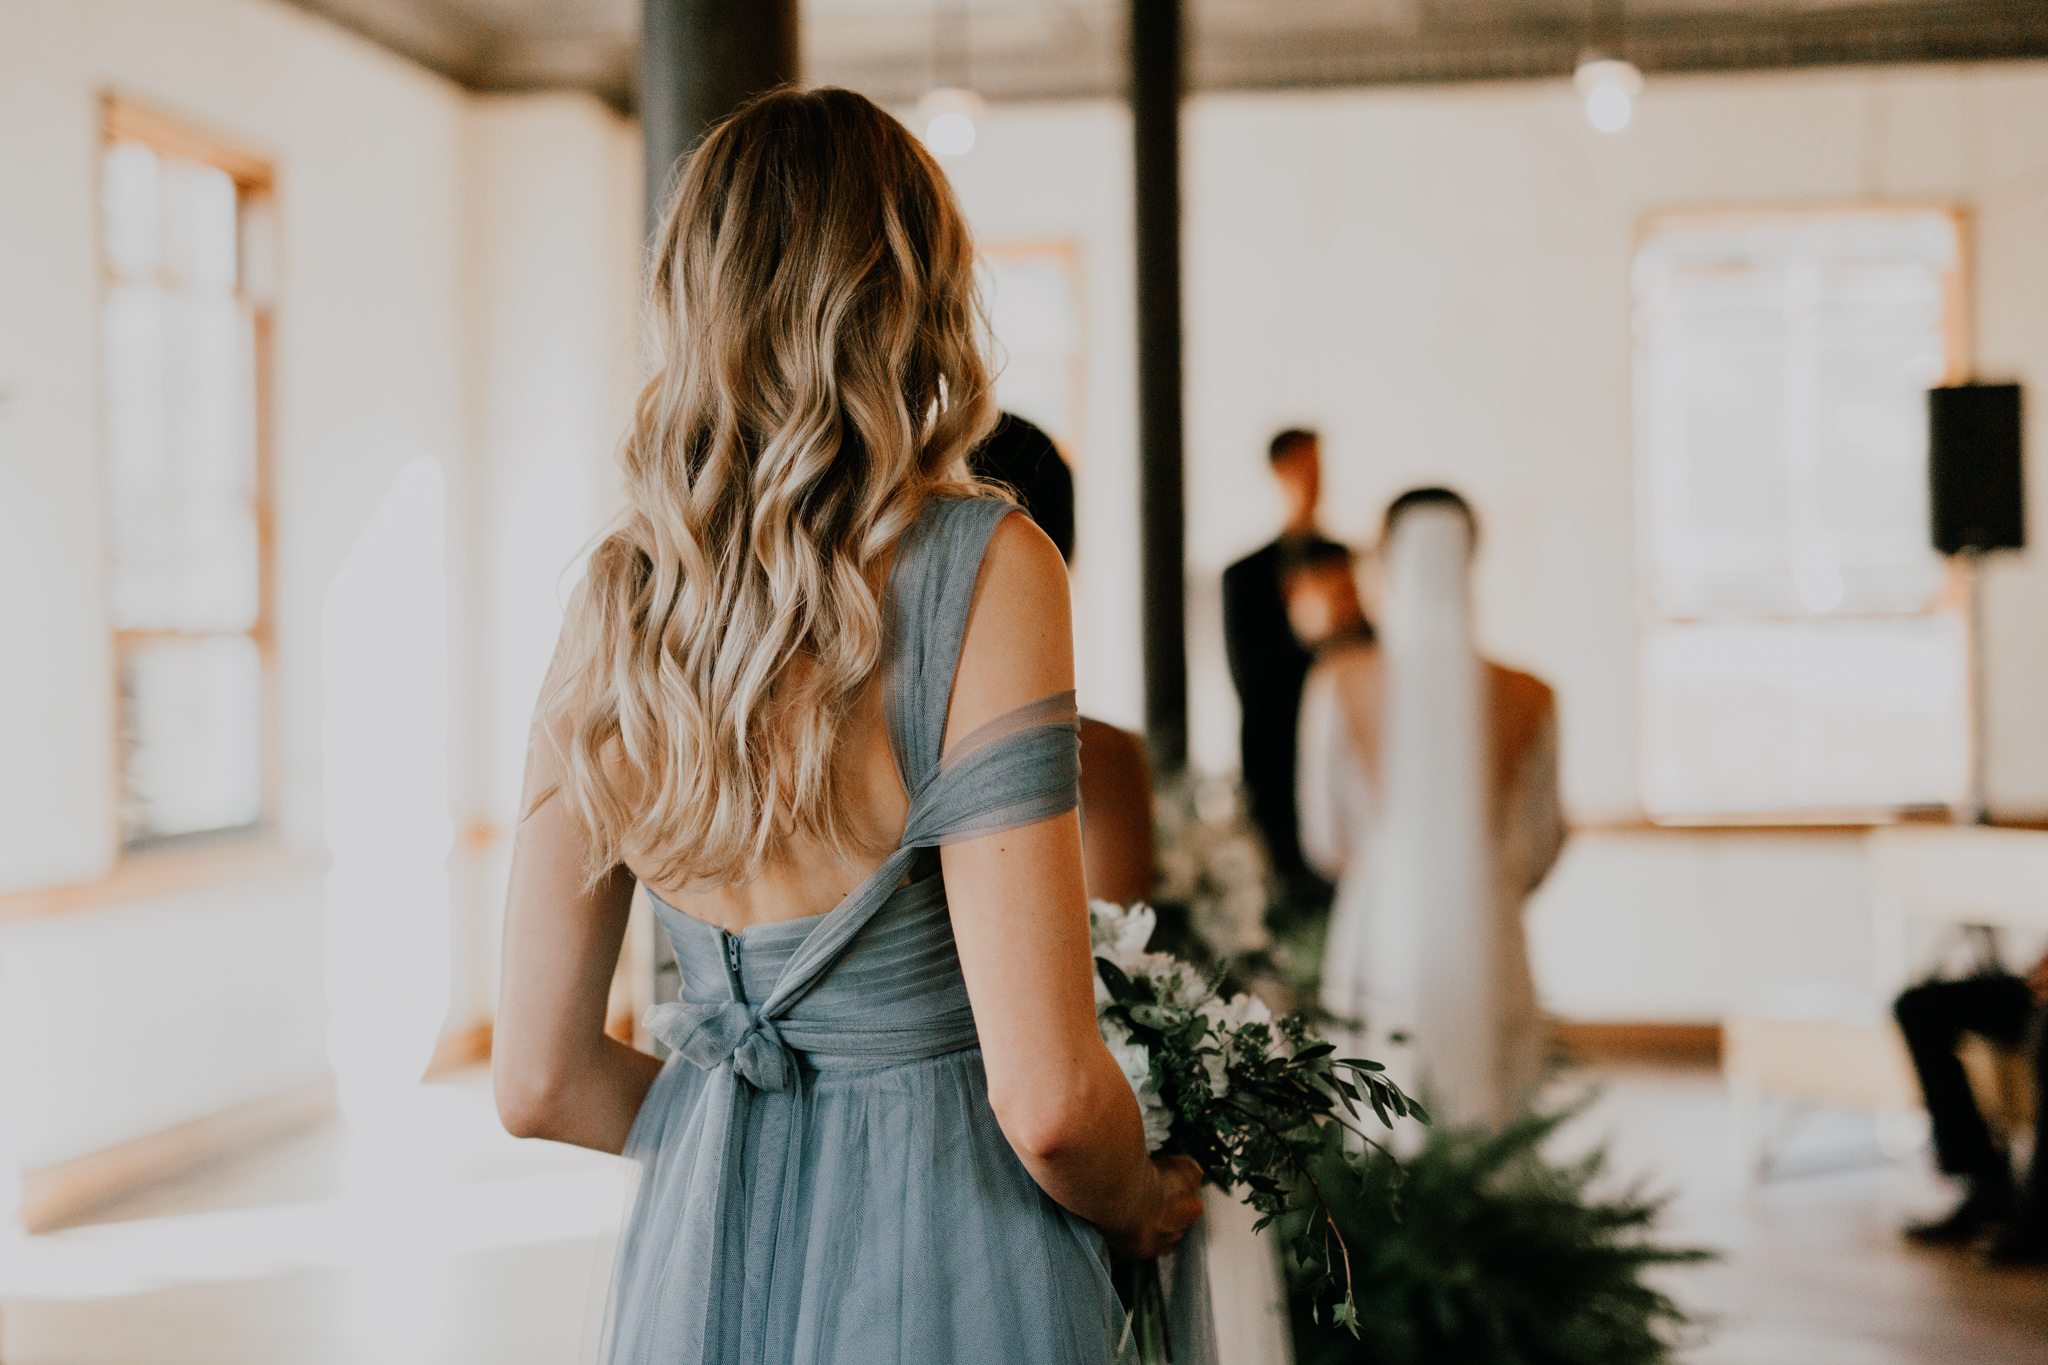 wedding-headlands-center-for-the-arts-sausalito-79.jpg